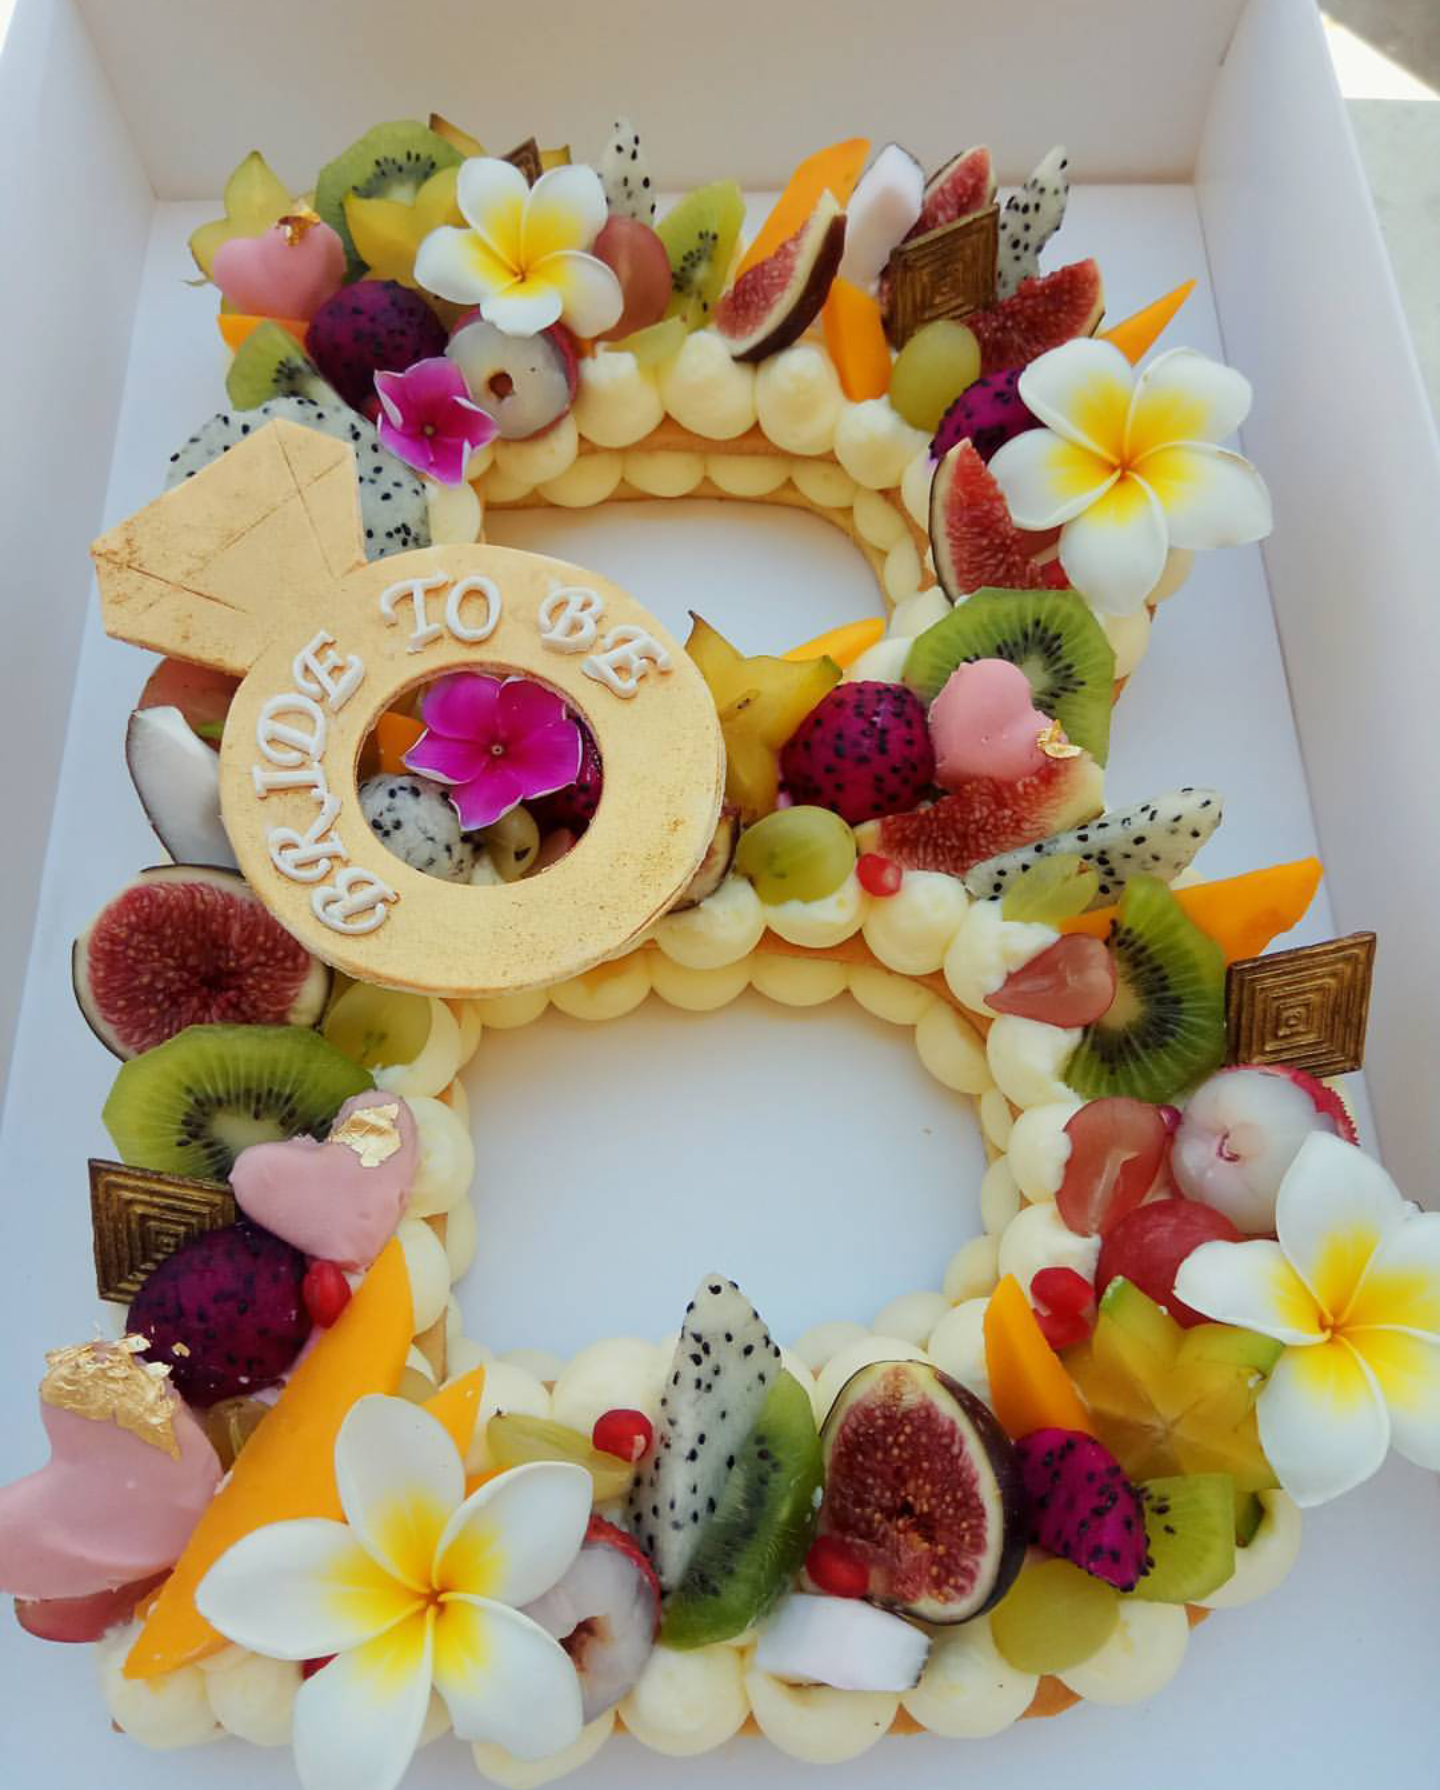 Fruit Cake Topping Ideas